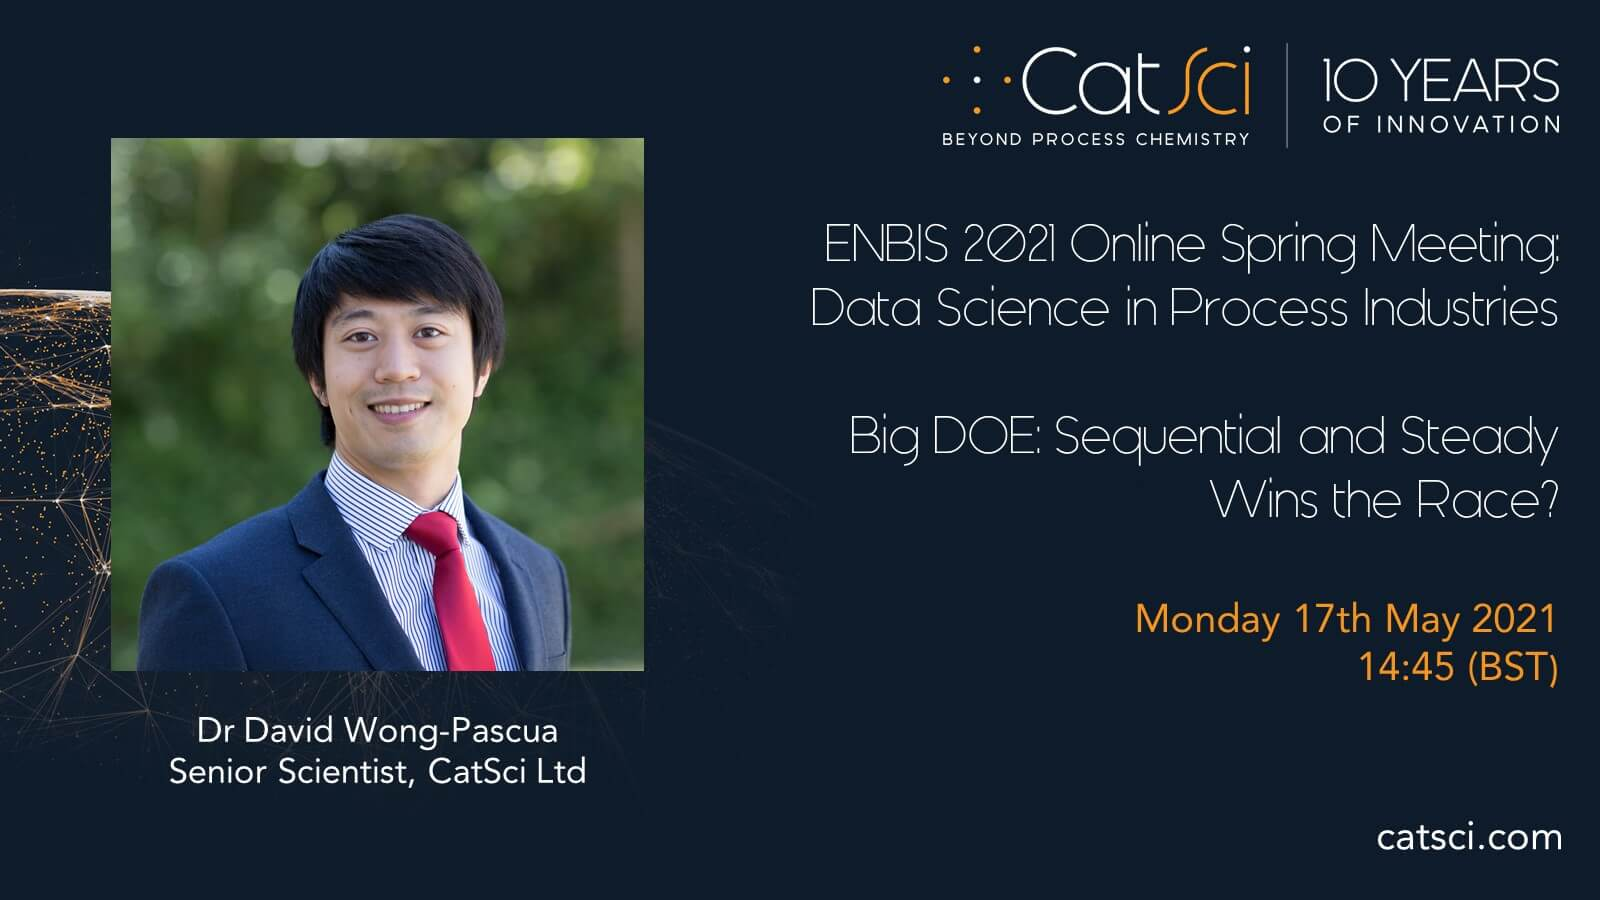 CatSci Senior Scientist, Dr David Wong-Pascua, to present at ENBIS 2021 Online Spring Meeting